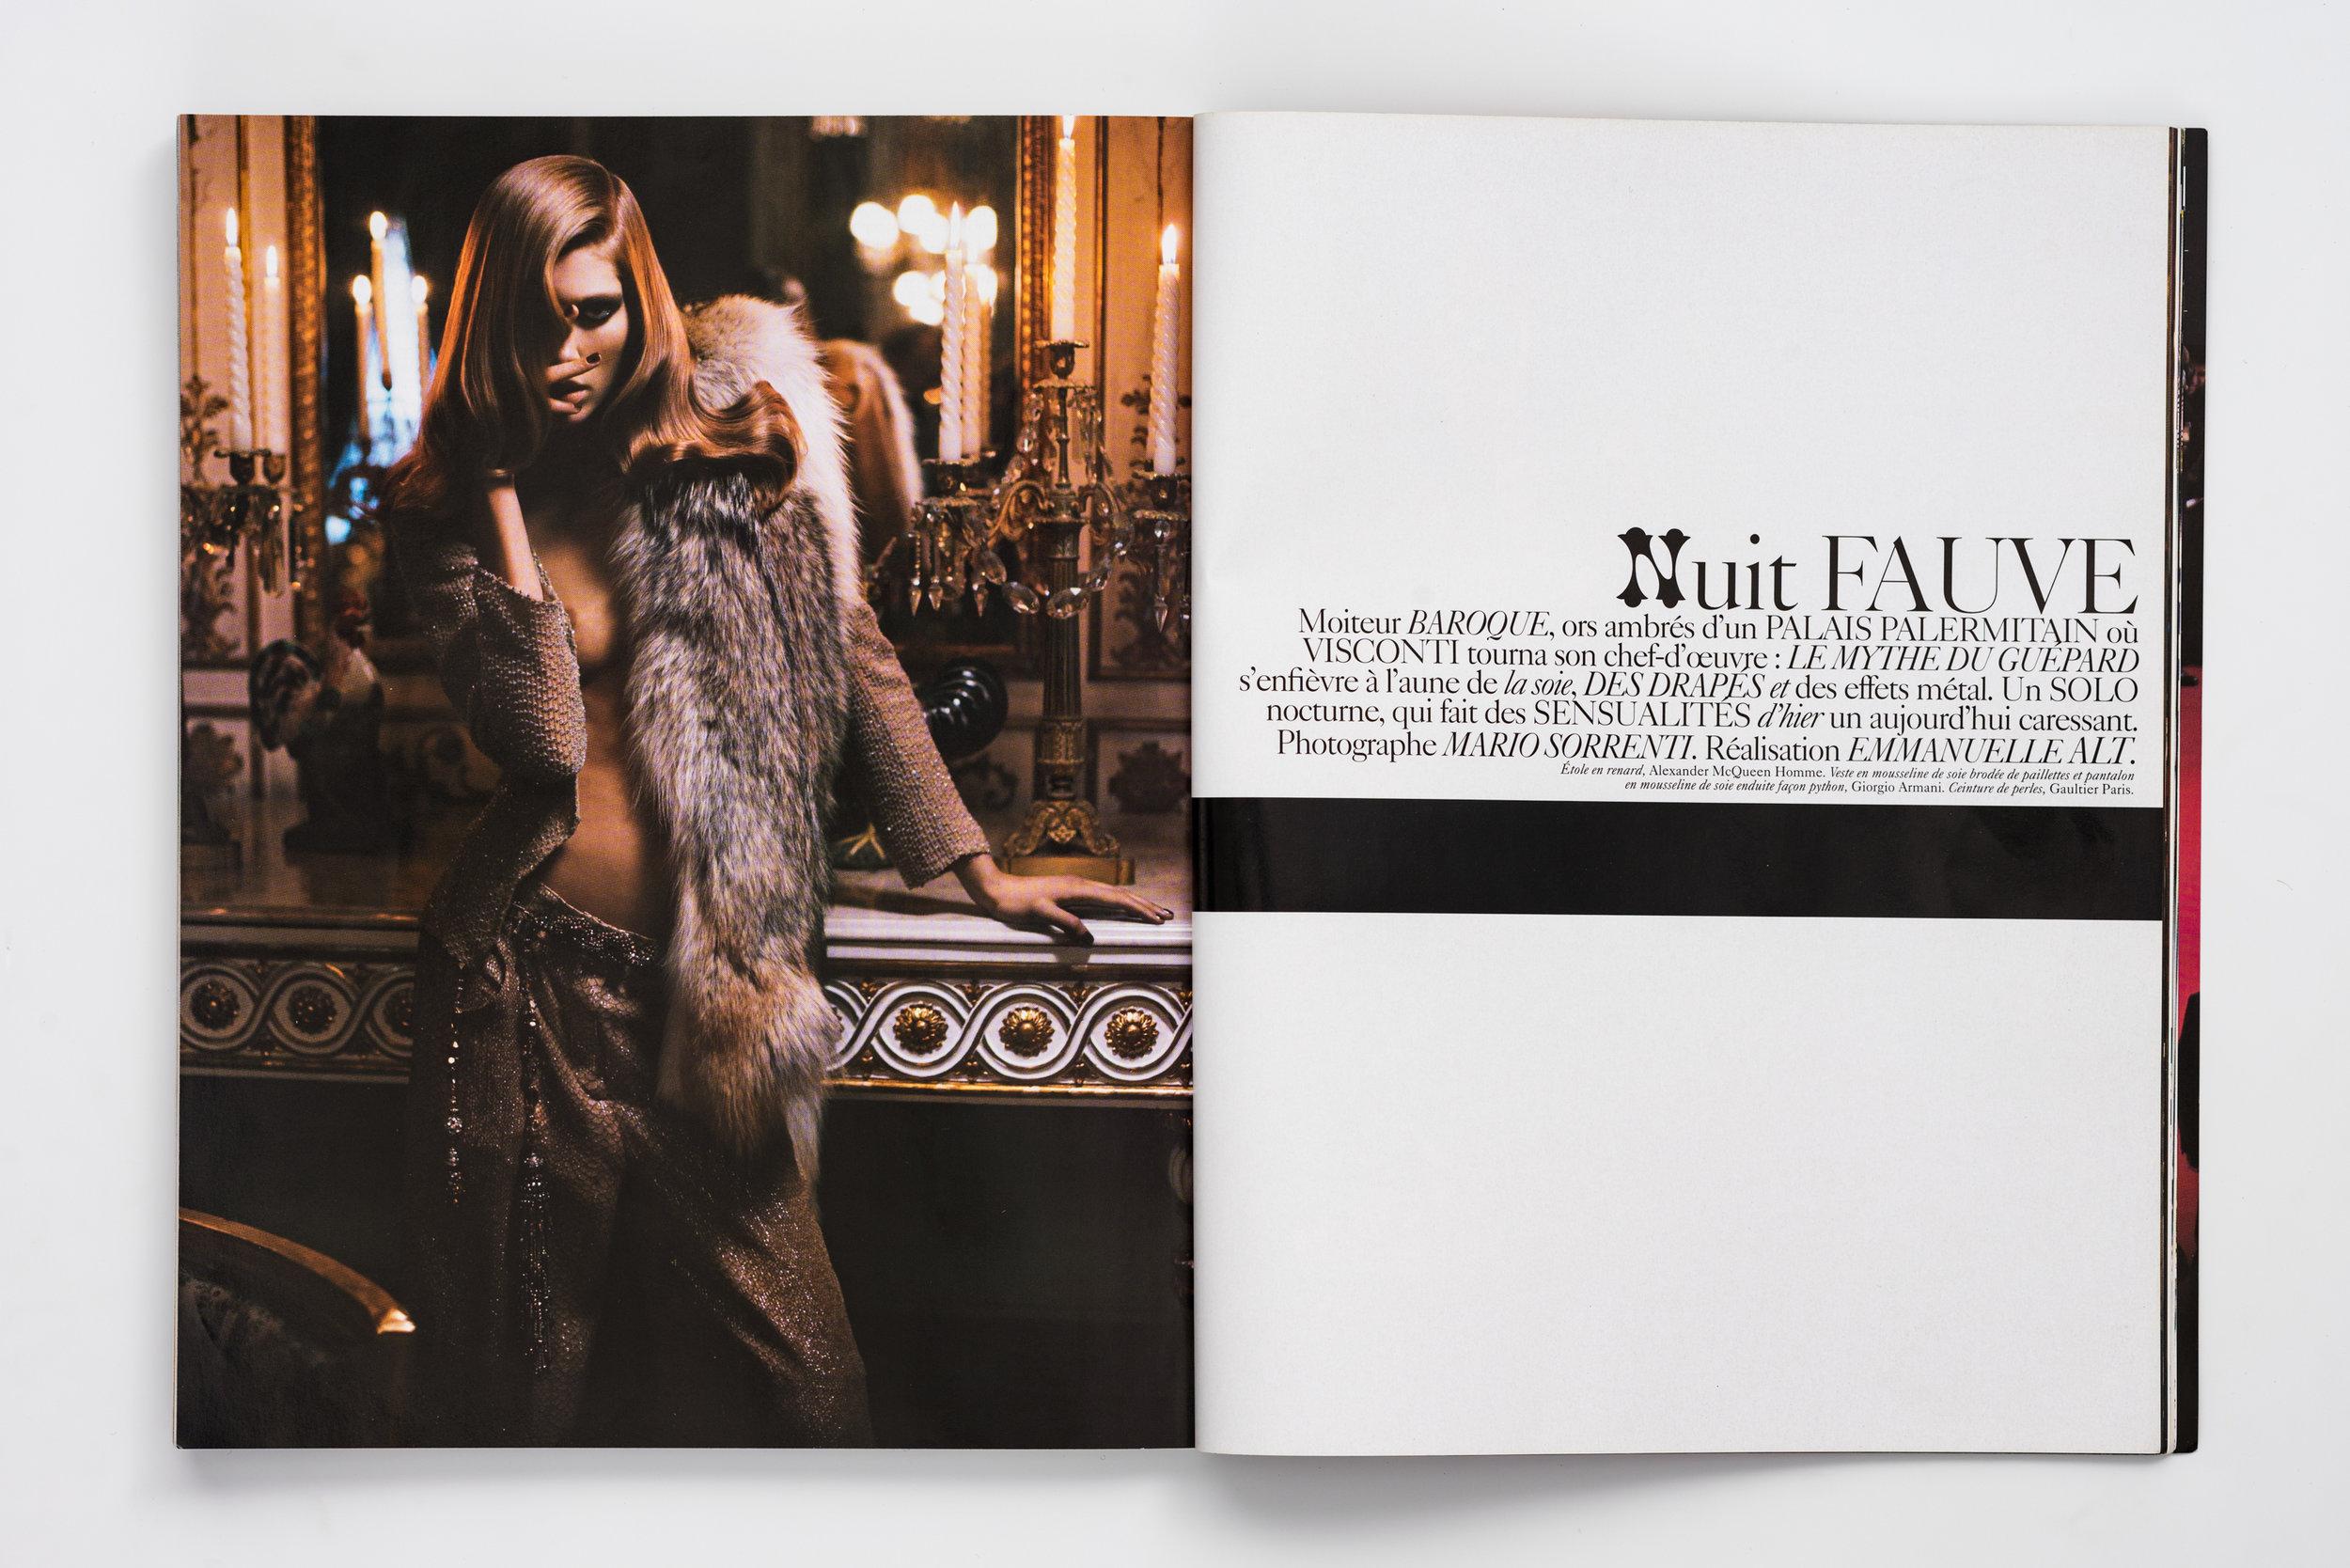 Iselin Steiro_Mario Sorrenti_Vogue Paris_Nuit Fauve_1.jpg